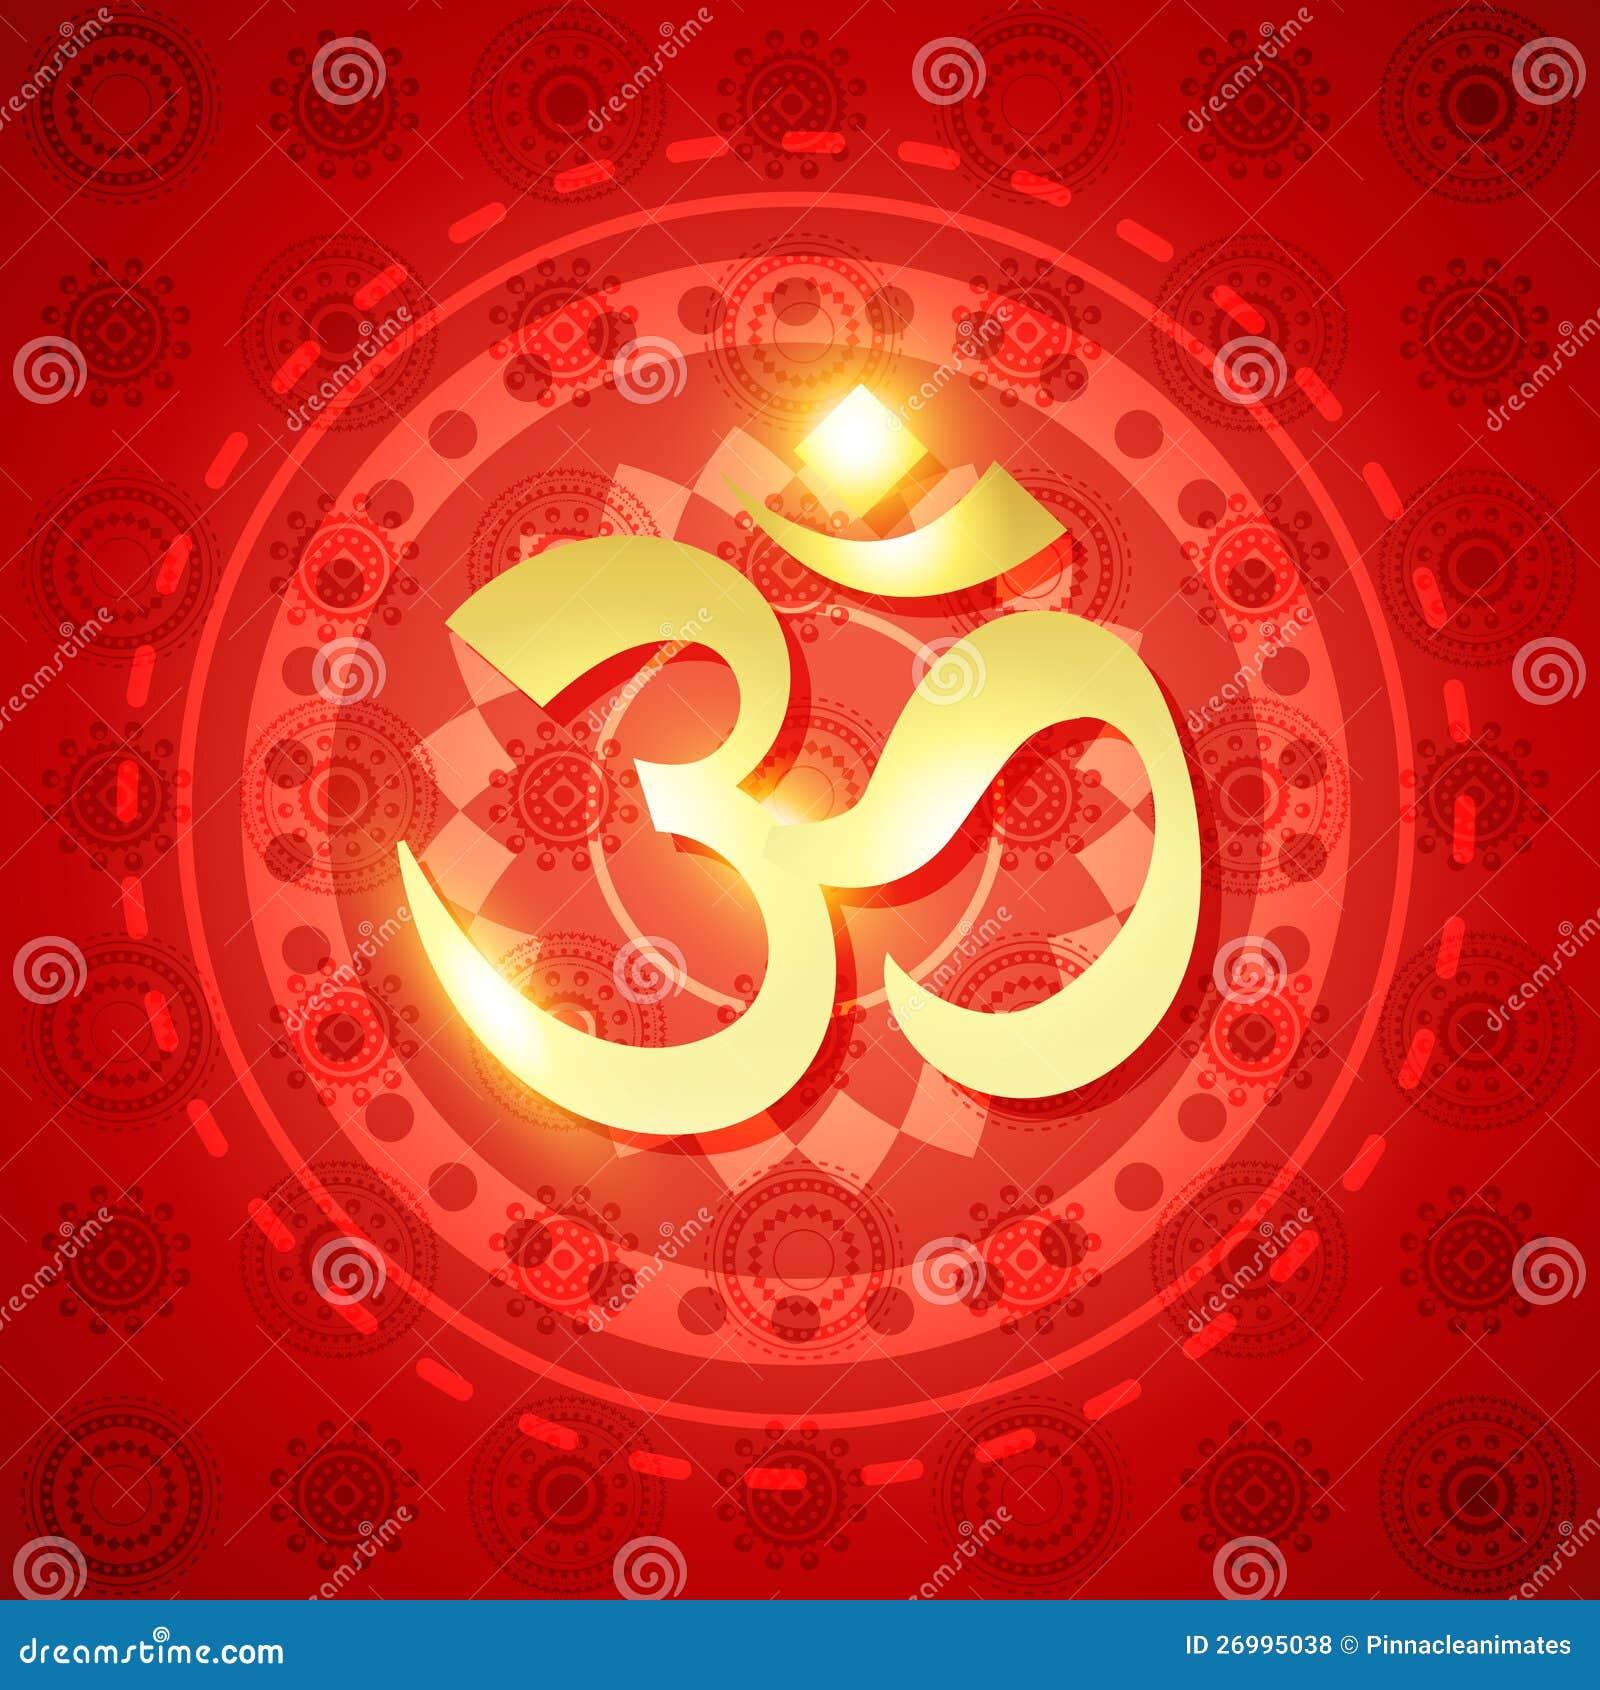 Shiny Hindu Om Royalty Free Stock Photos Image 26995038